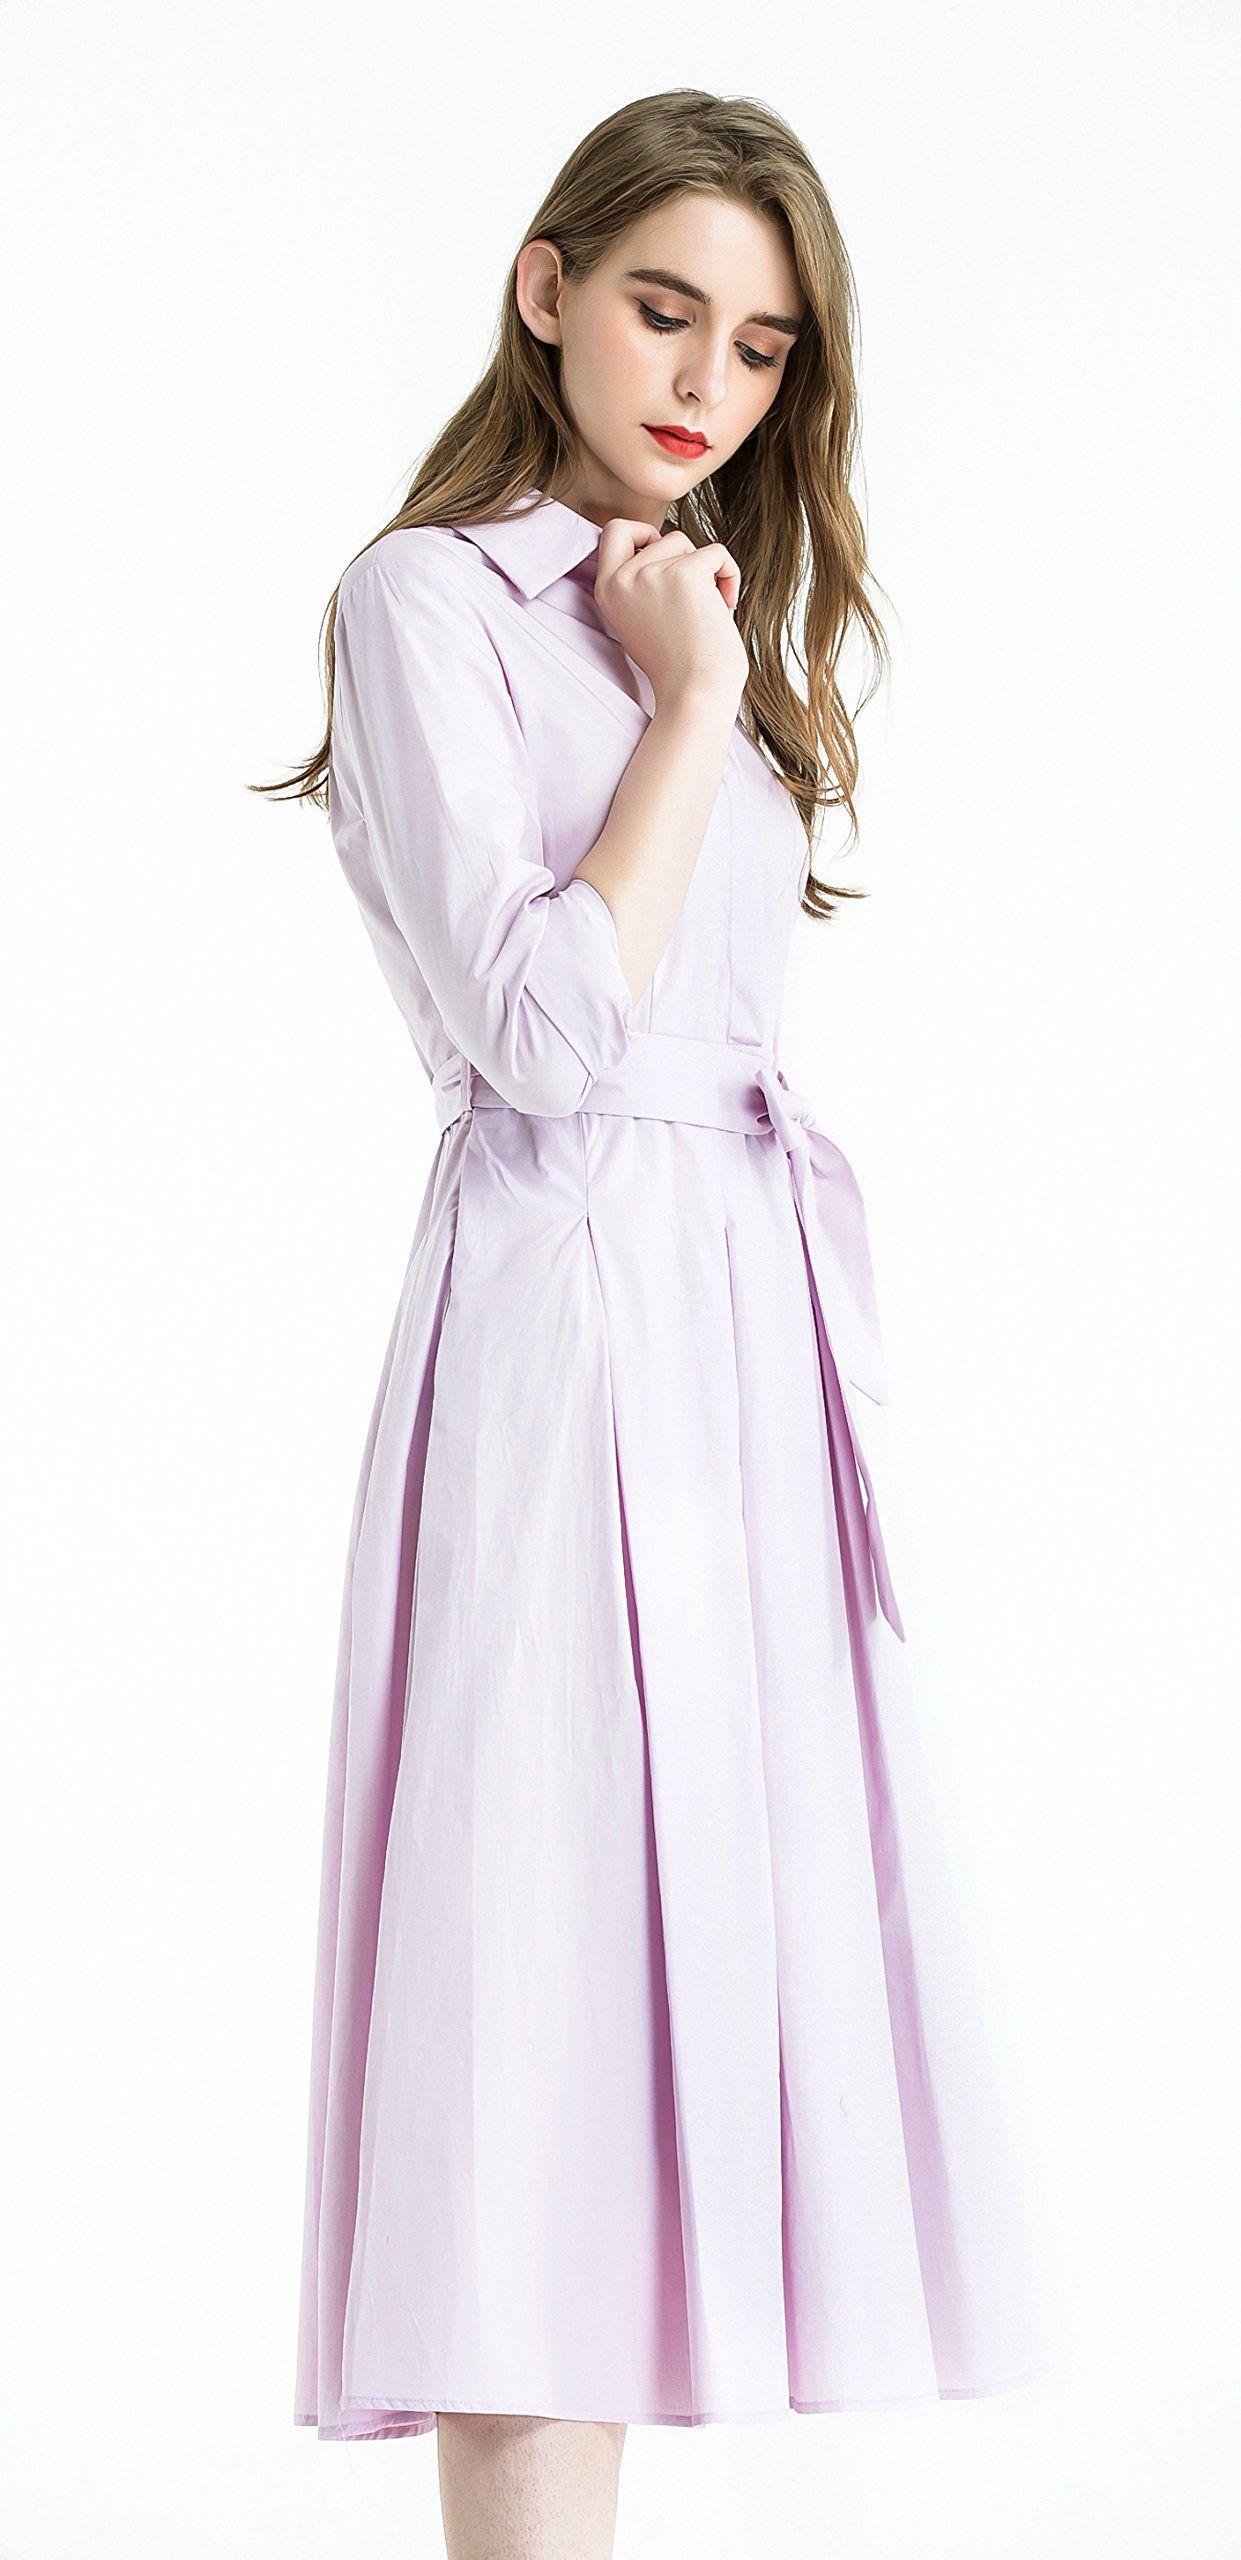 Maternity fashion designer maternity dresses zredurn womenÃâuaâ